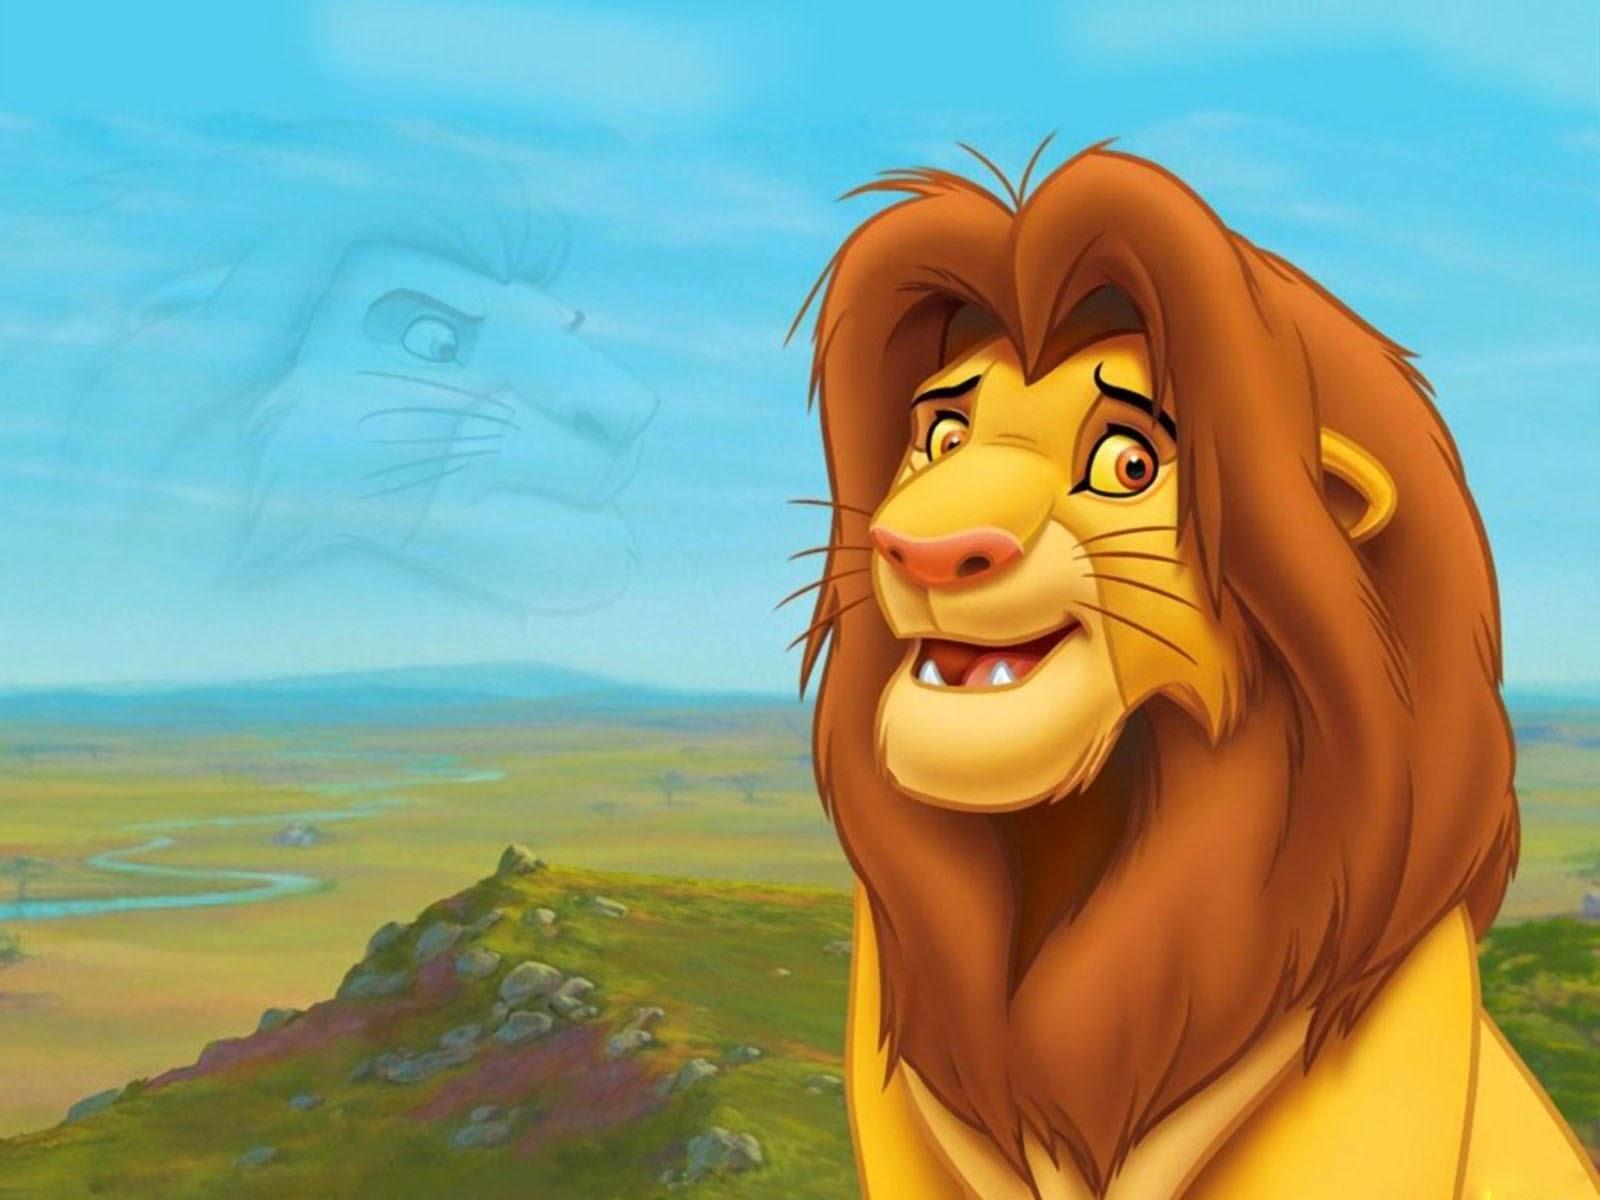 95 Foto Gambar Kartun Singa Terlihat Cantik